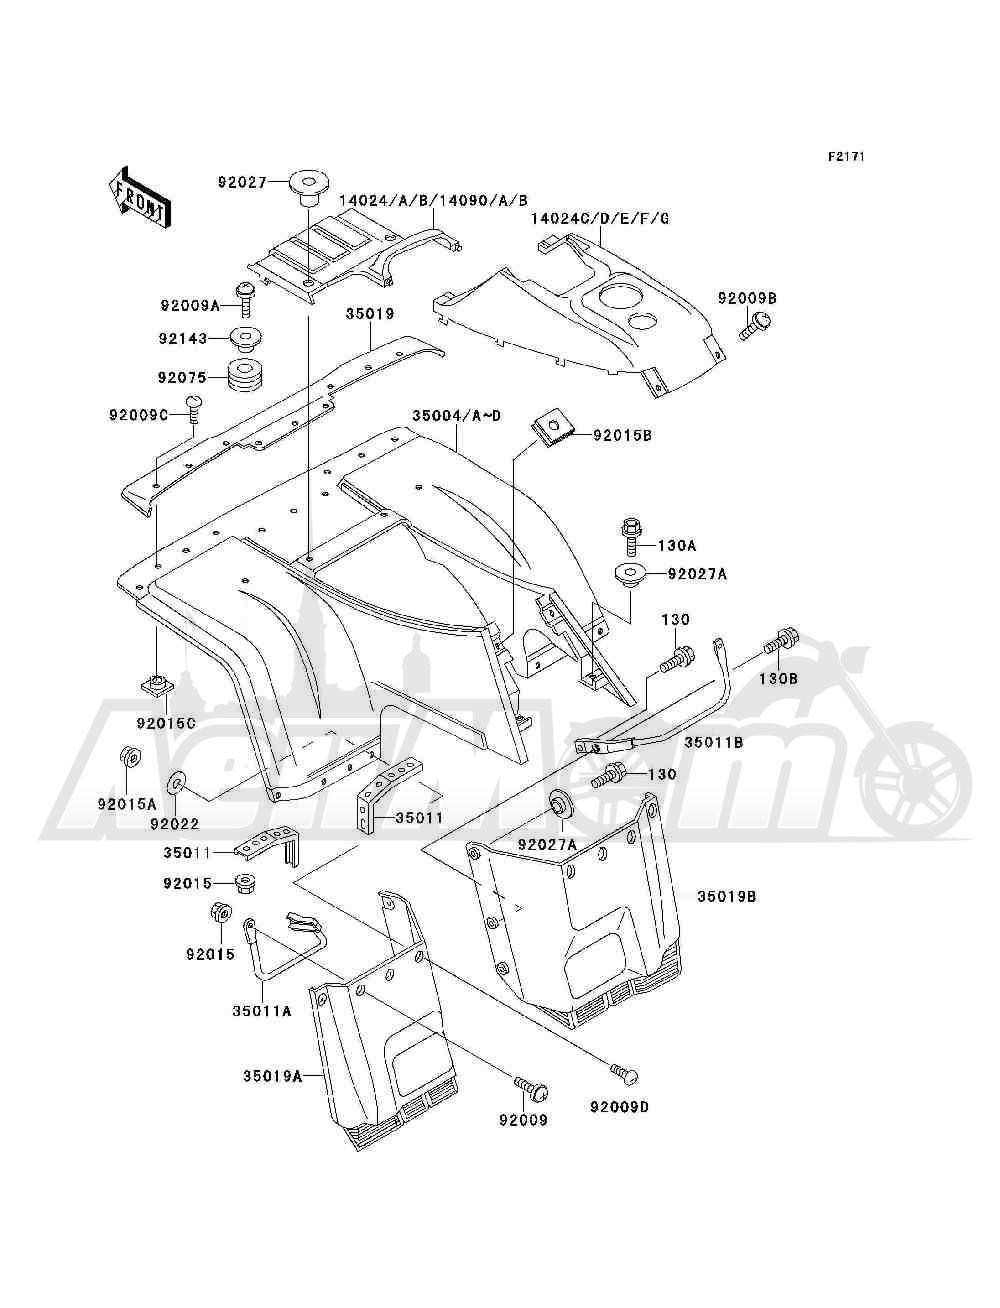 Запчасти для Квадроцикла Kawasaki 1994 BAYOU 300 4X4 (KLF300-C6) Раздел: FRONT FENDER(S) | переднее крыло (S)